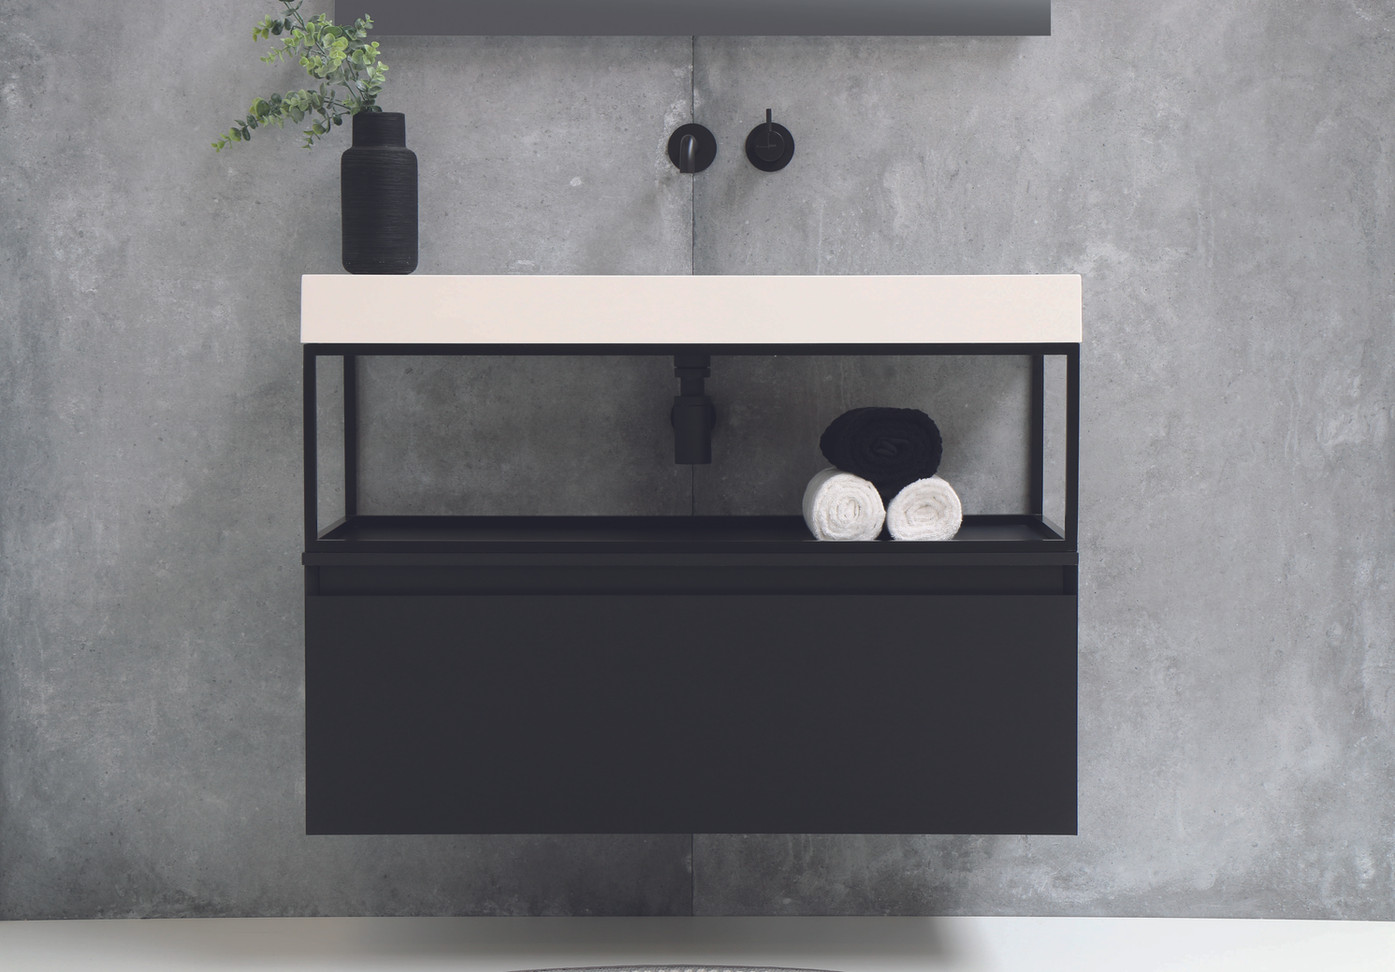 Tablet højglans hvid - Ferro ramme - møbel 1 skuffe mat sort